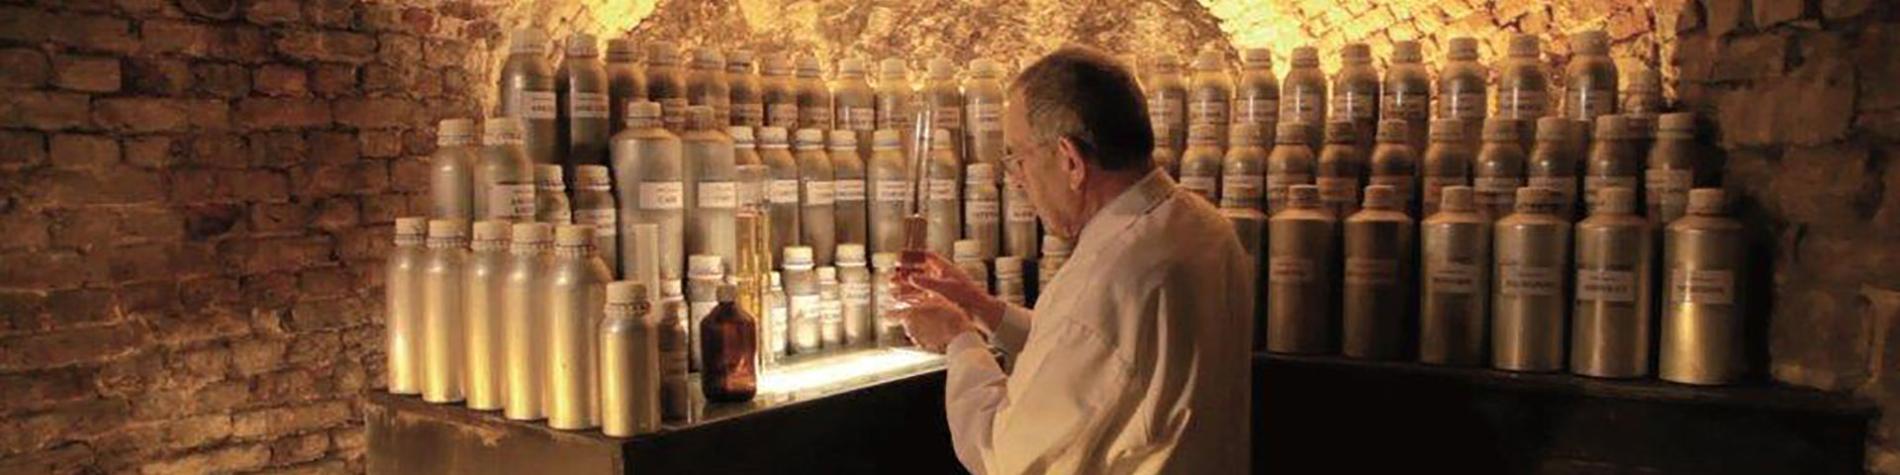 Atelier - Parfumerie - Guy Delforge